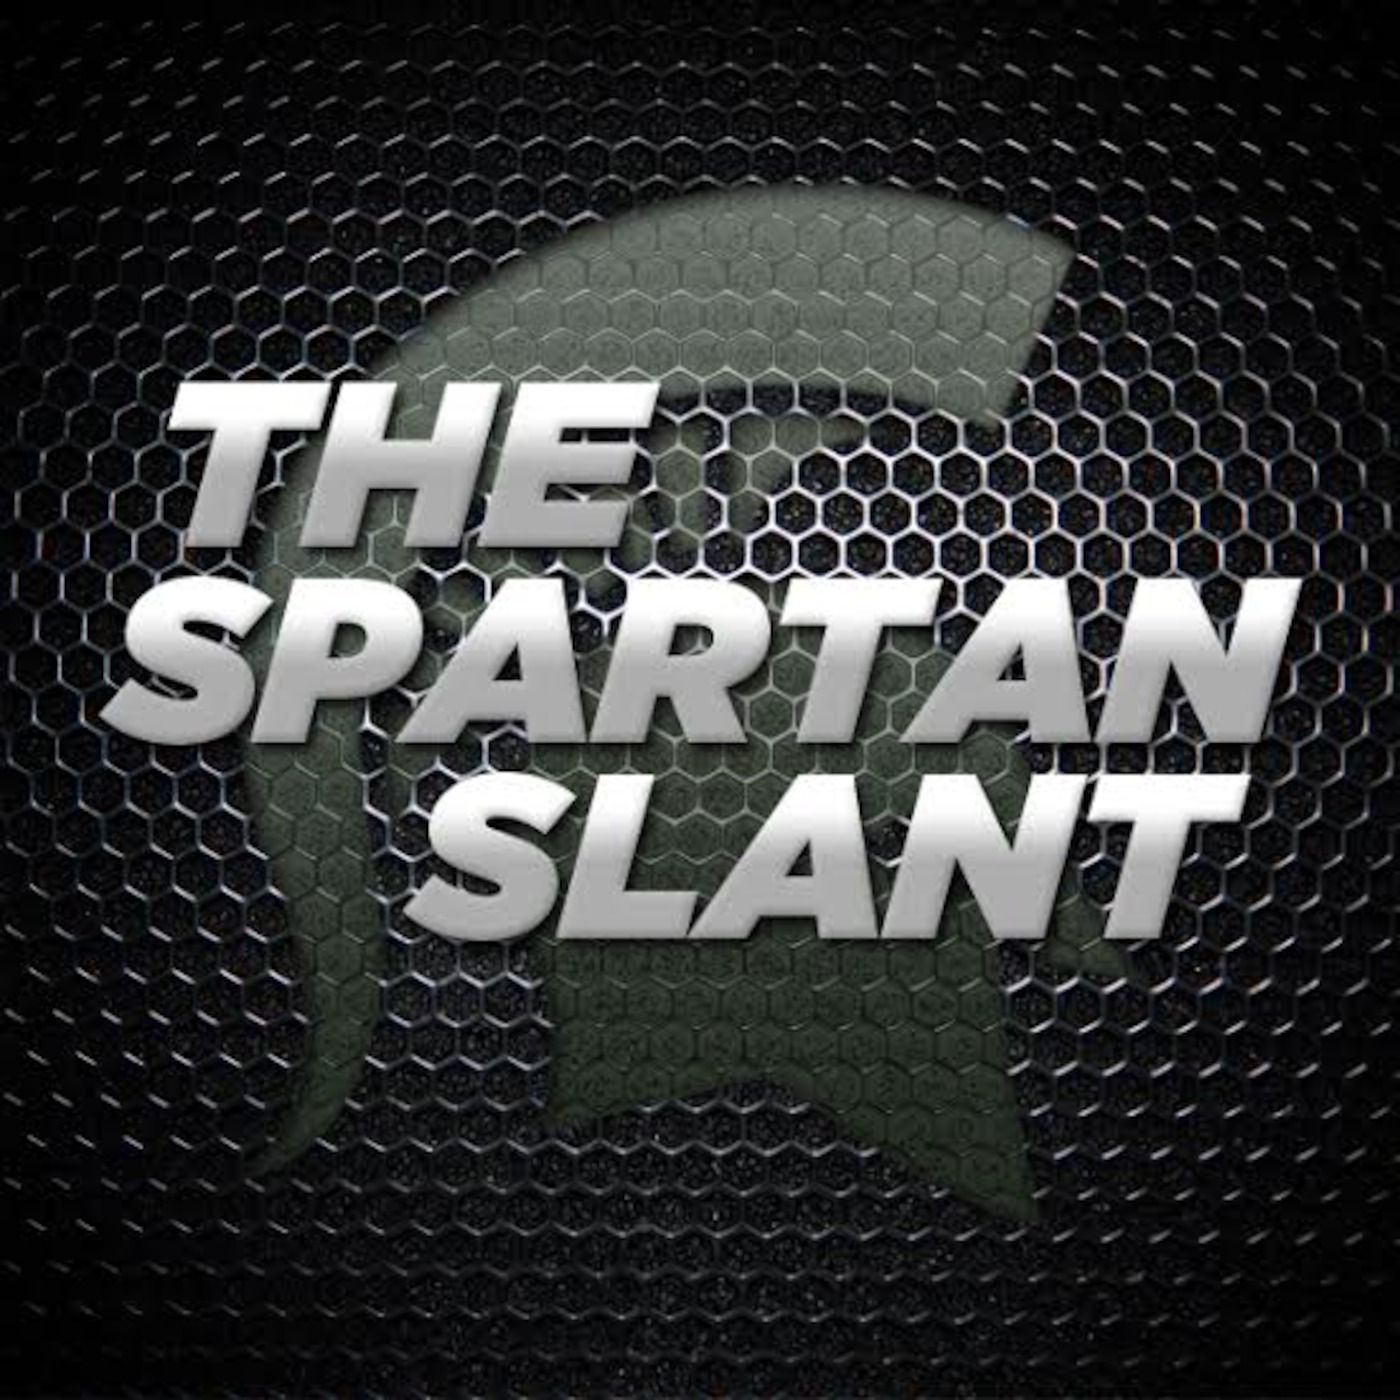 The Spartan Slant